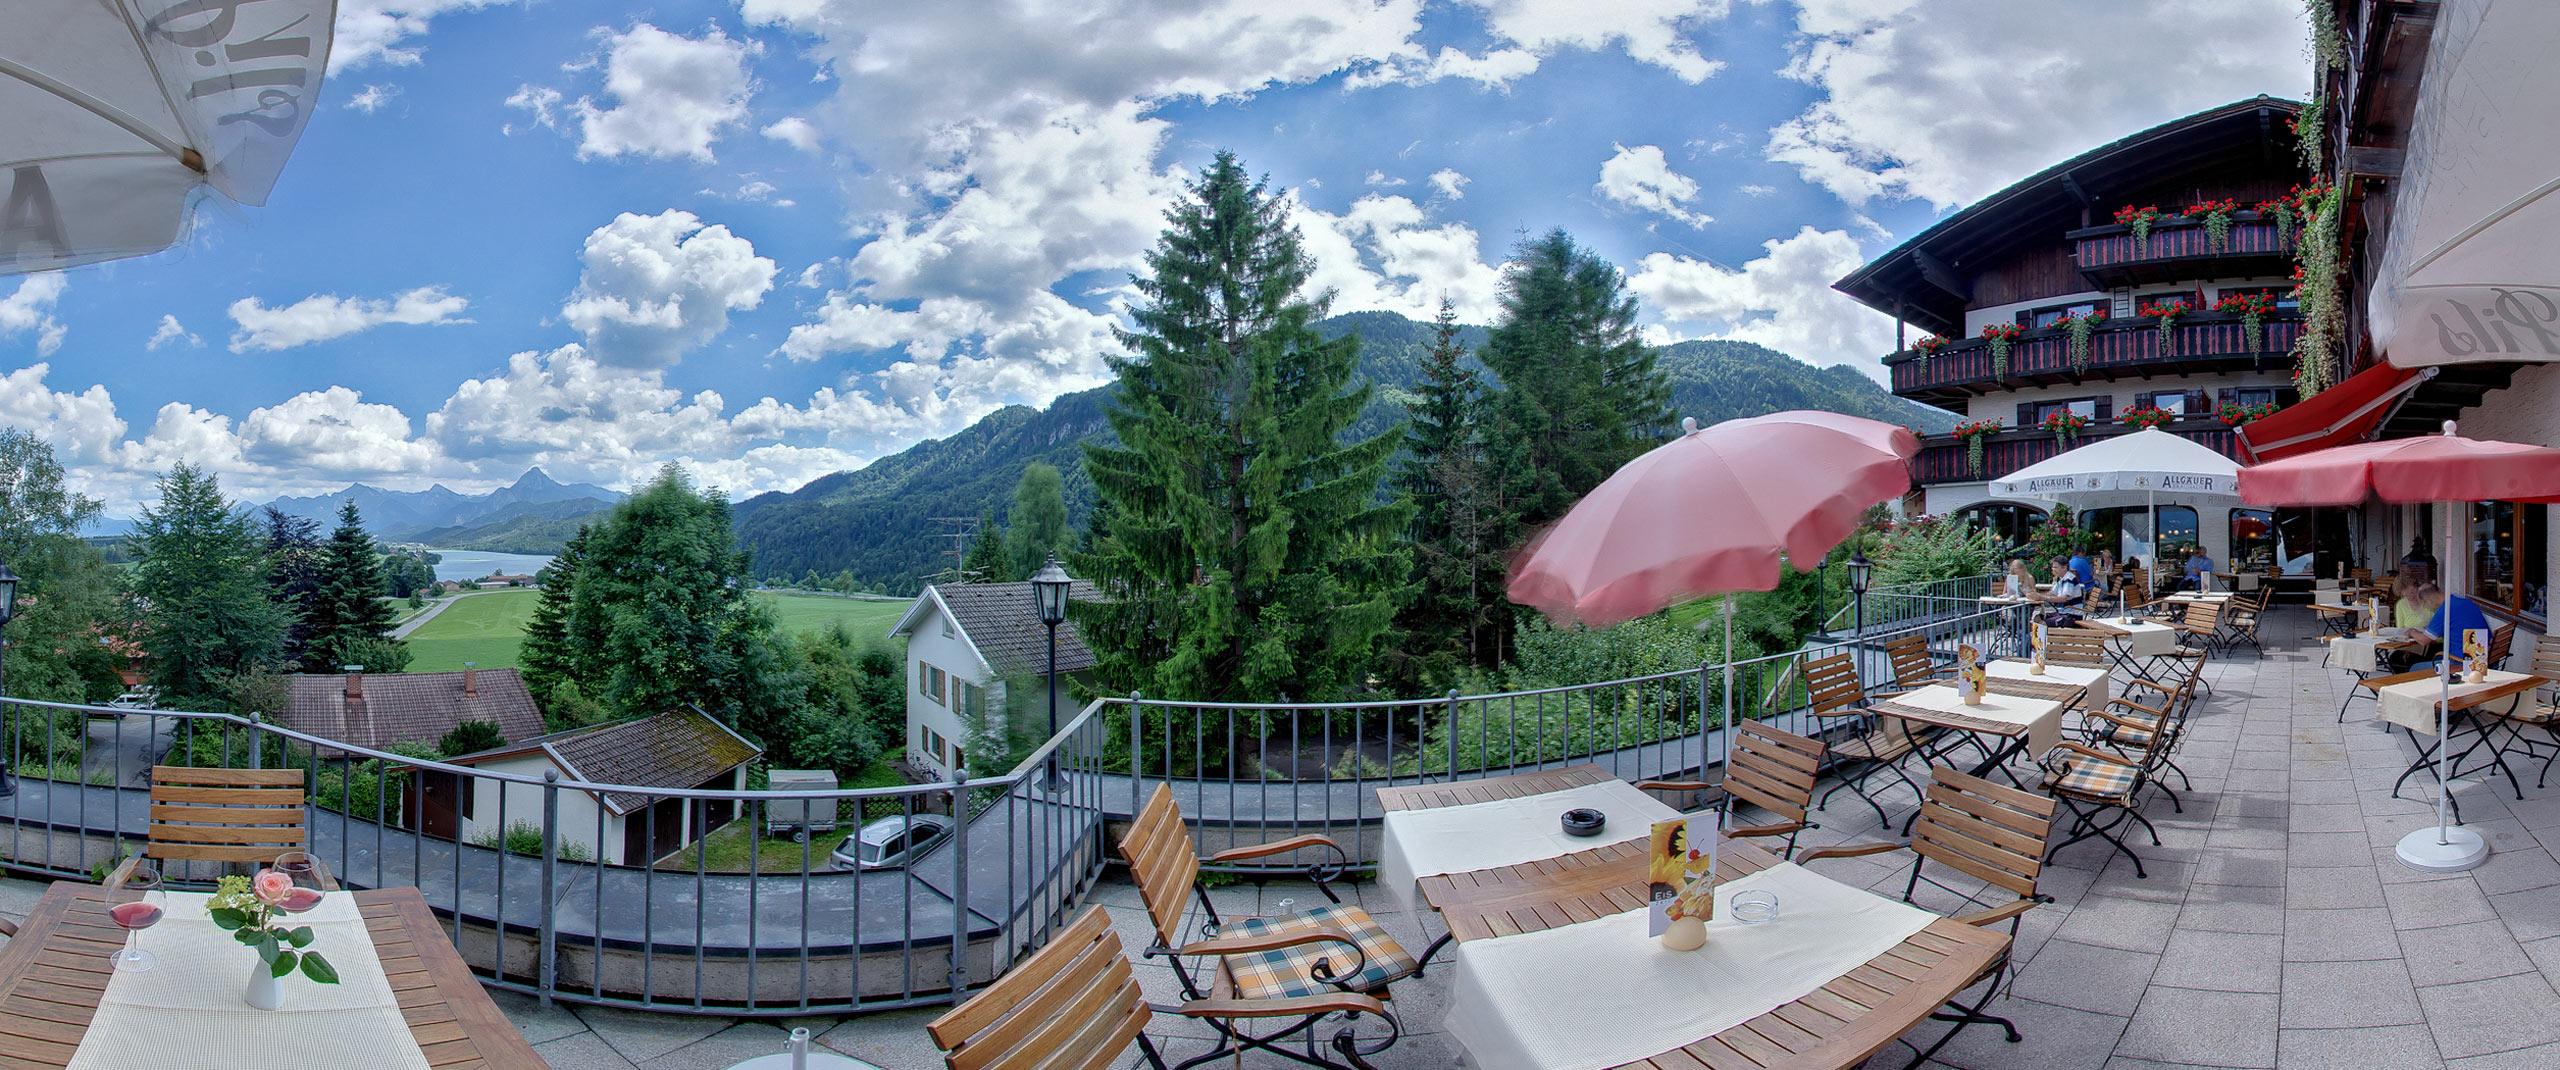 Hotel Bergruh Wellness